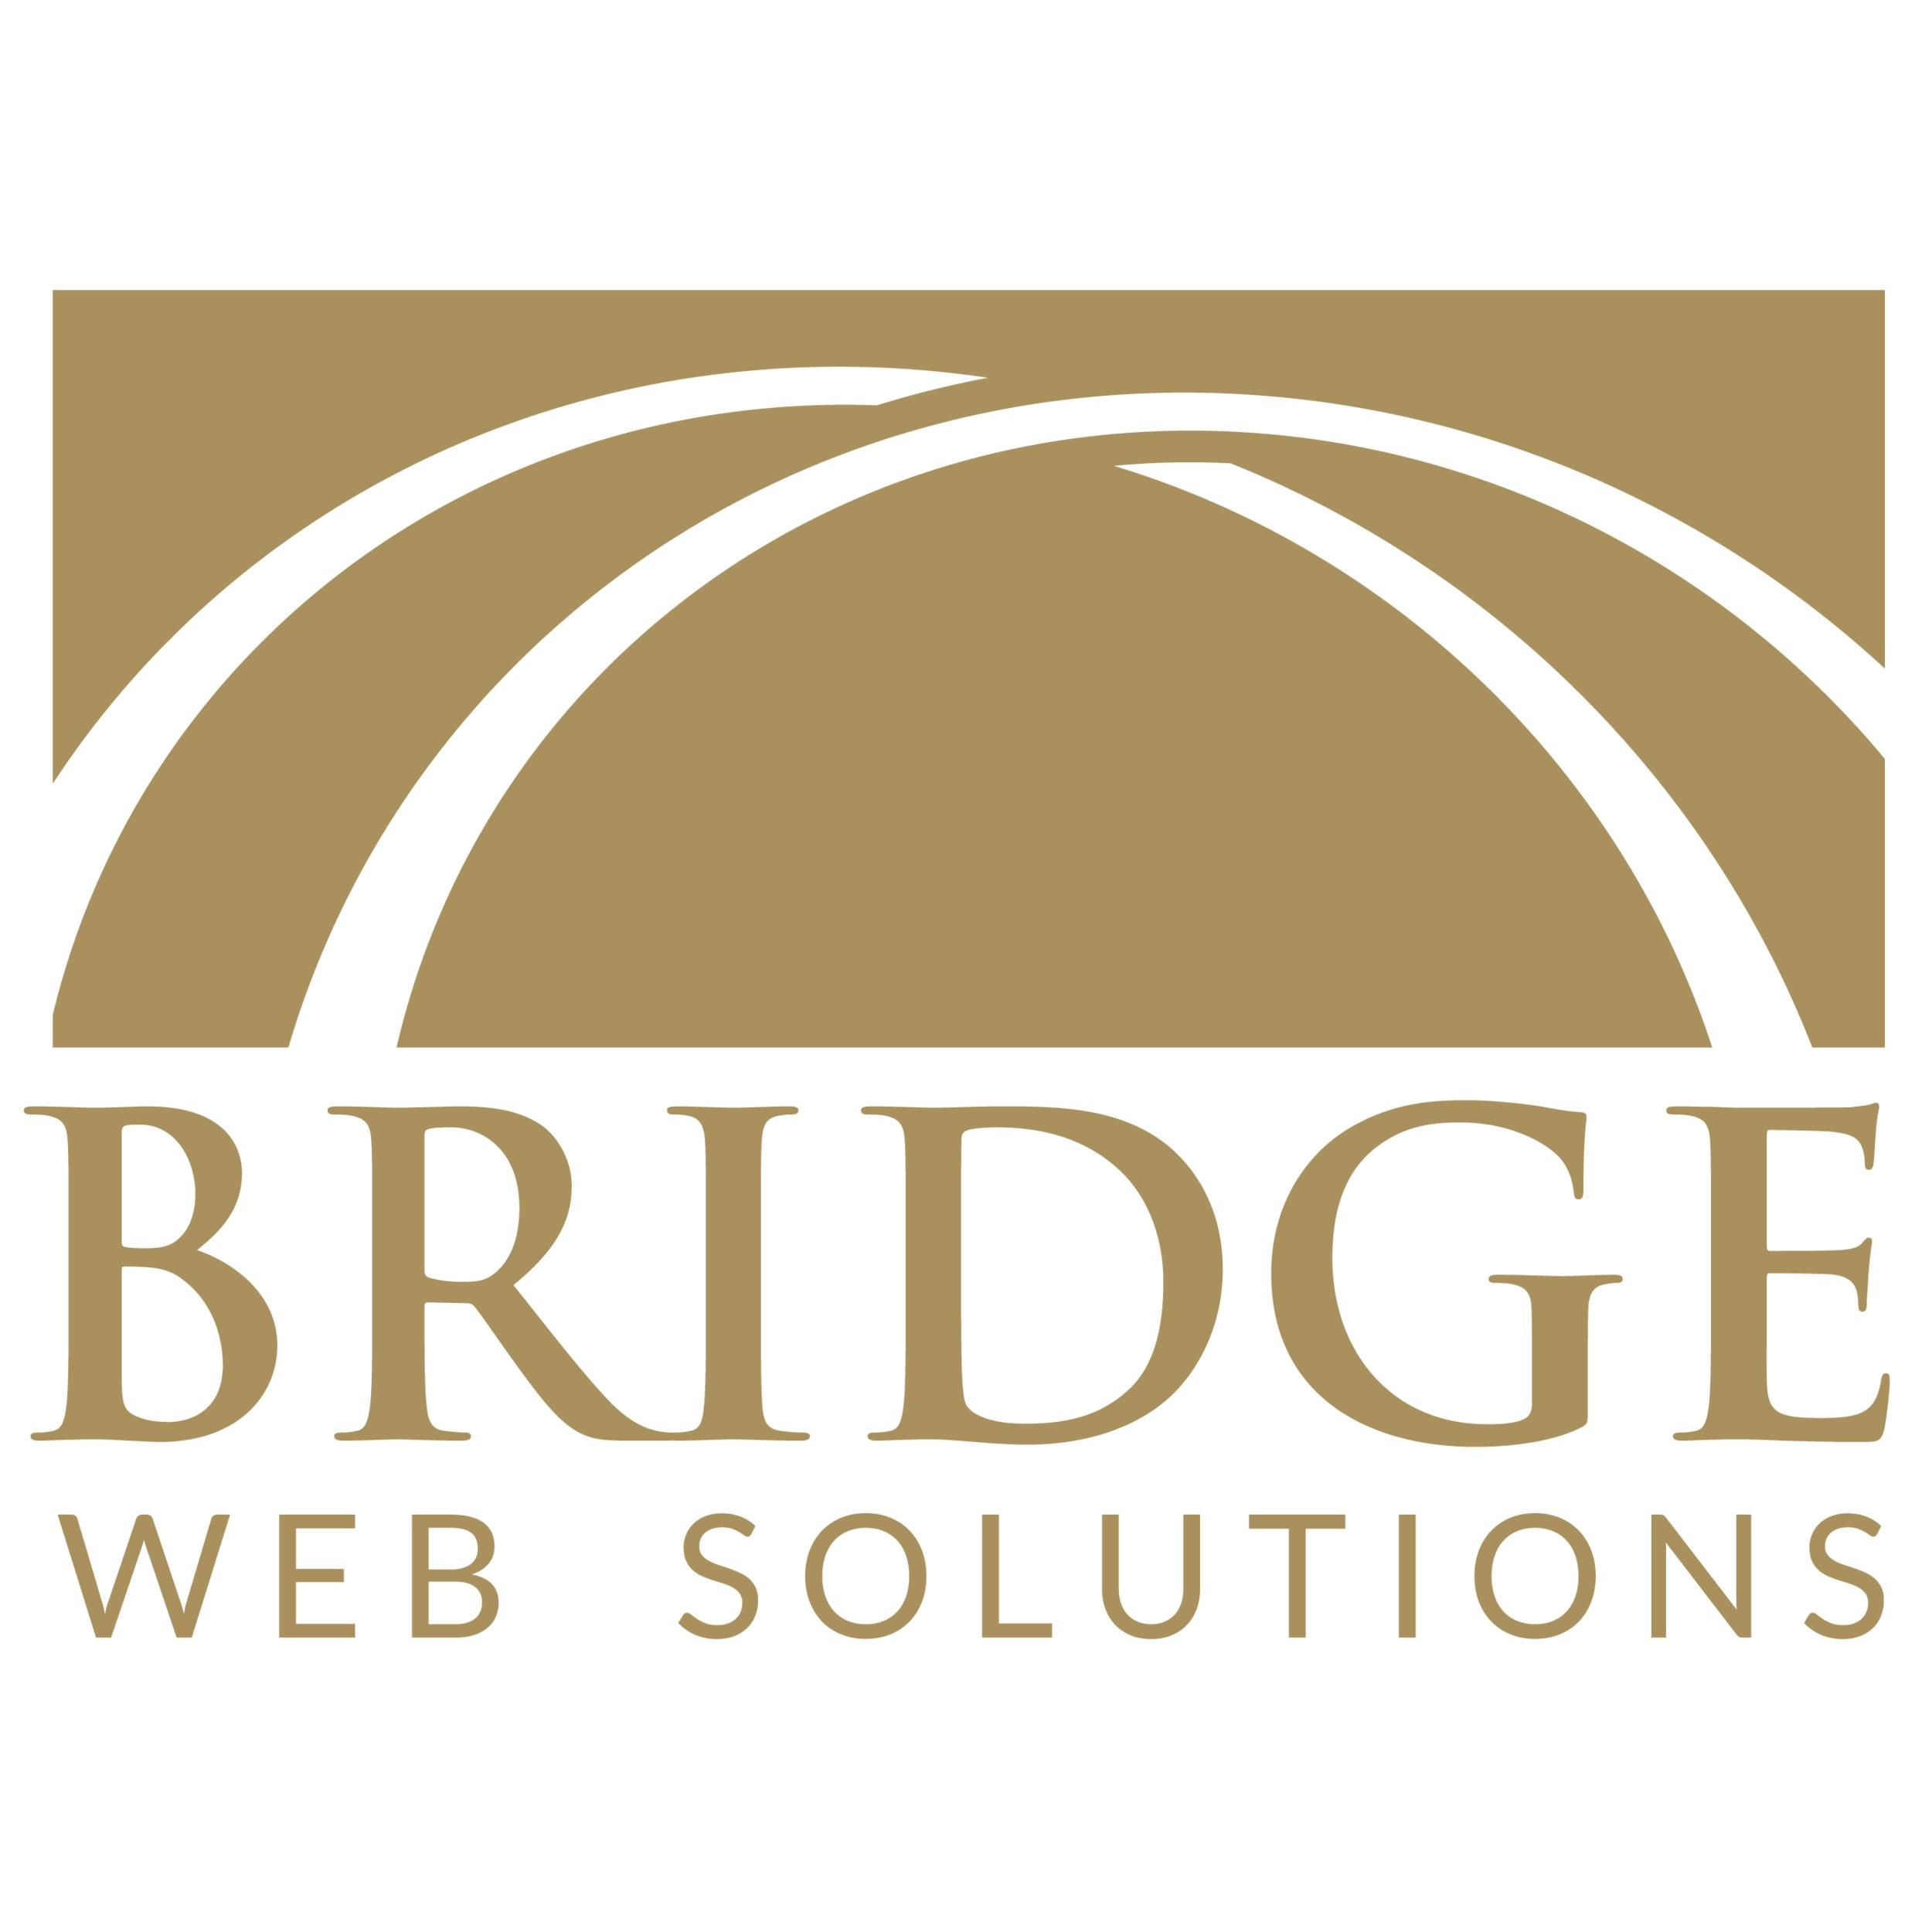 http://bridgeweb.solutions/